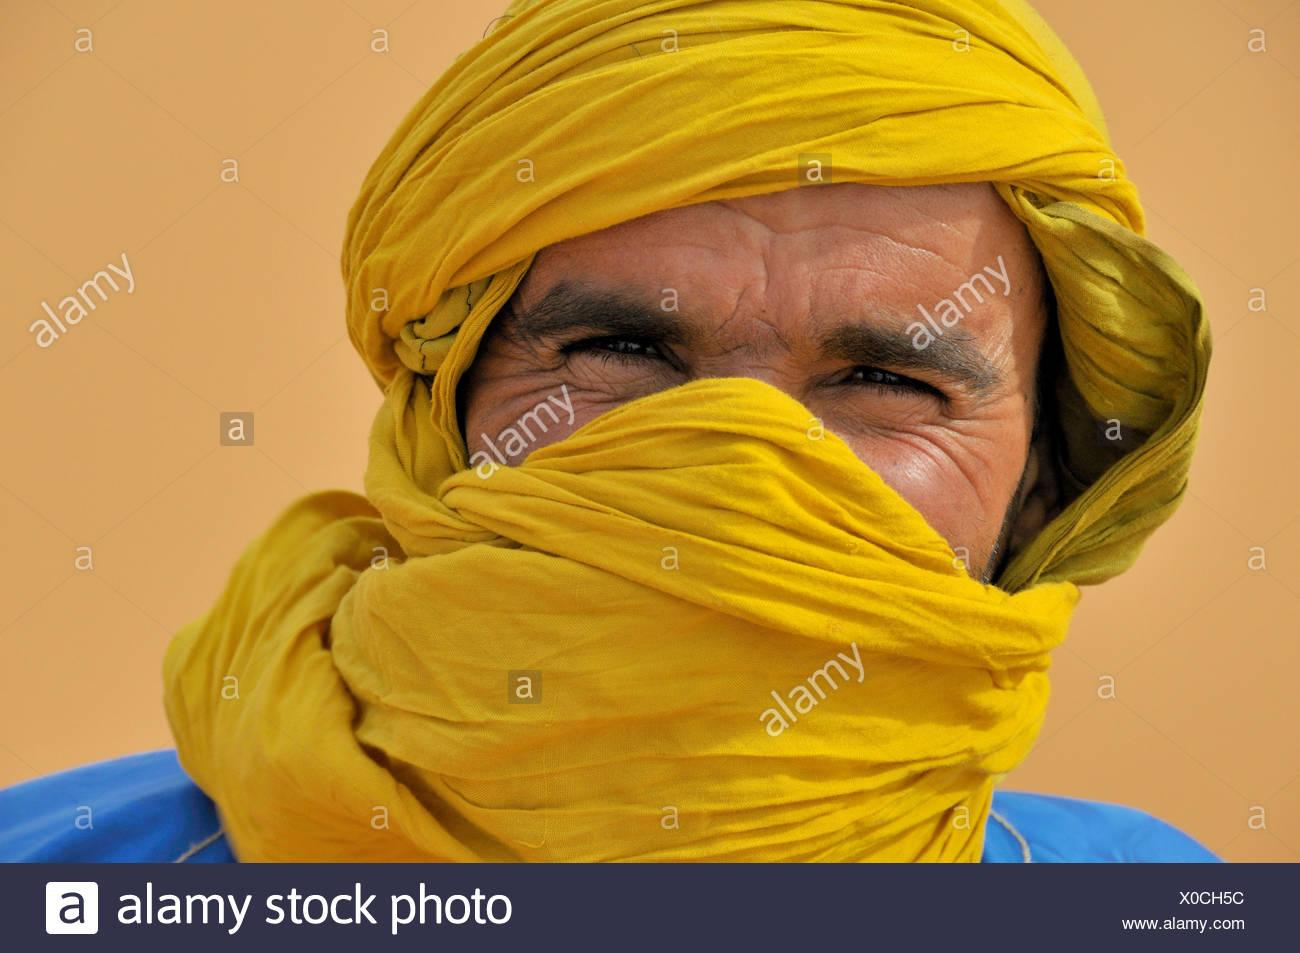 berber with traditional tagelmust, portrait, Morocco, Erg Chebbi, Sahara Stock Photo